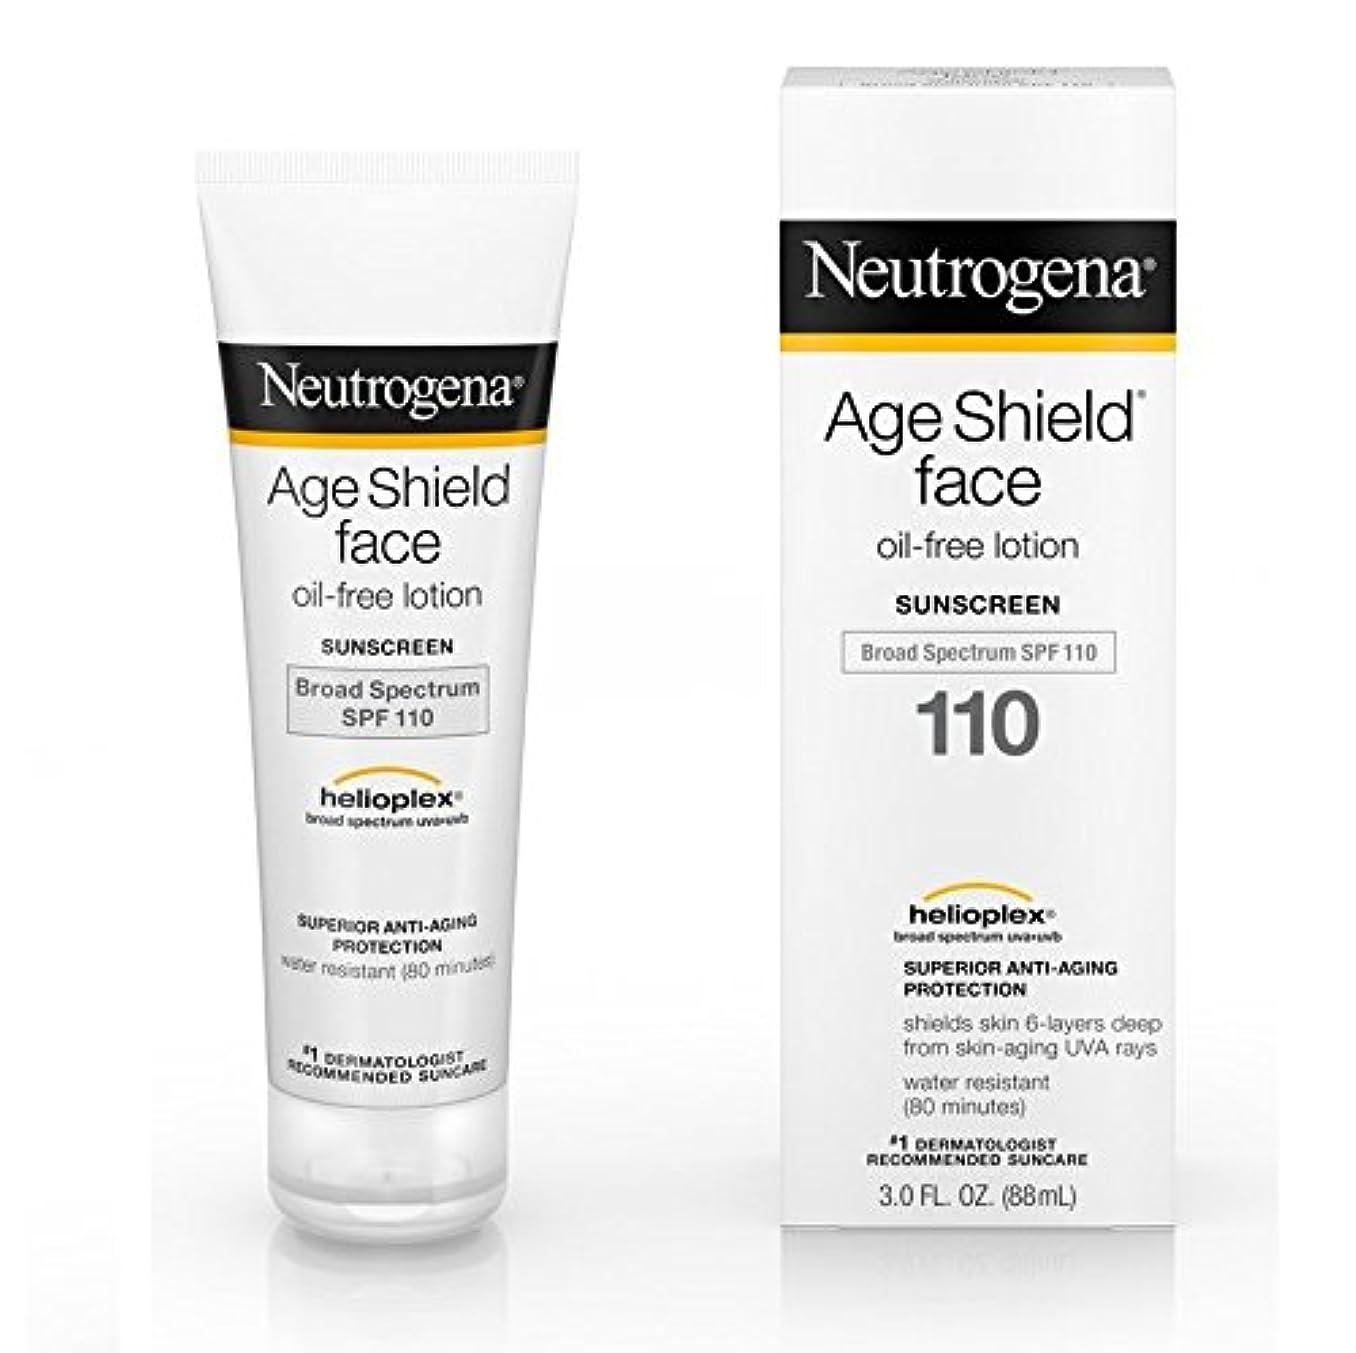 菊最大驚き【海外直送品】Neutrogena Age Shield? Face Oil-Free Lotion Sunscreen Broad Spectrum SPF 110 - 3 FL OZ(88ml)